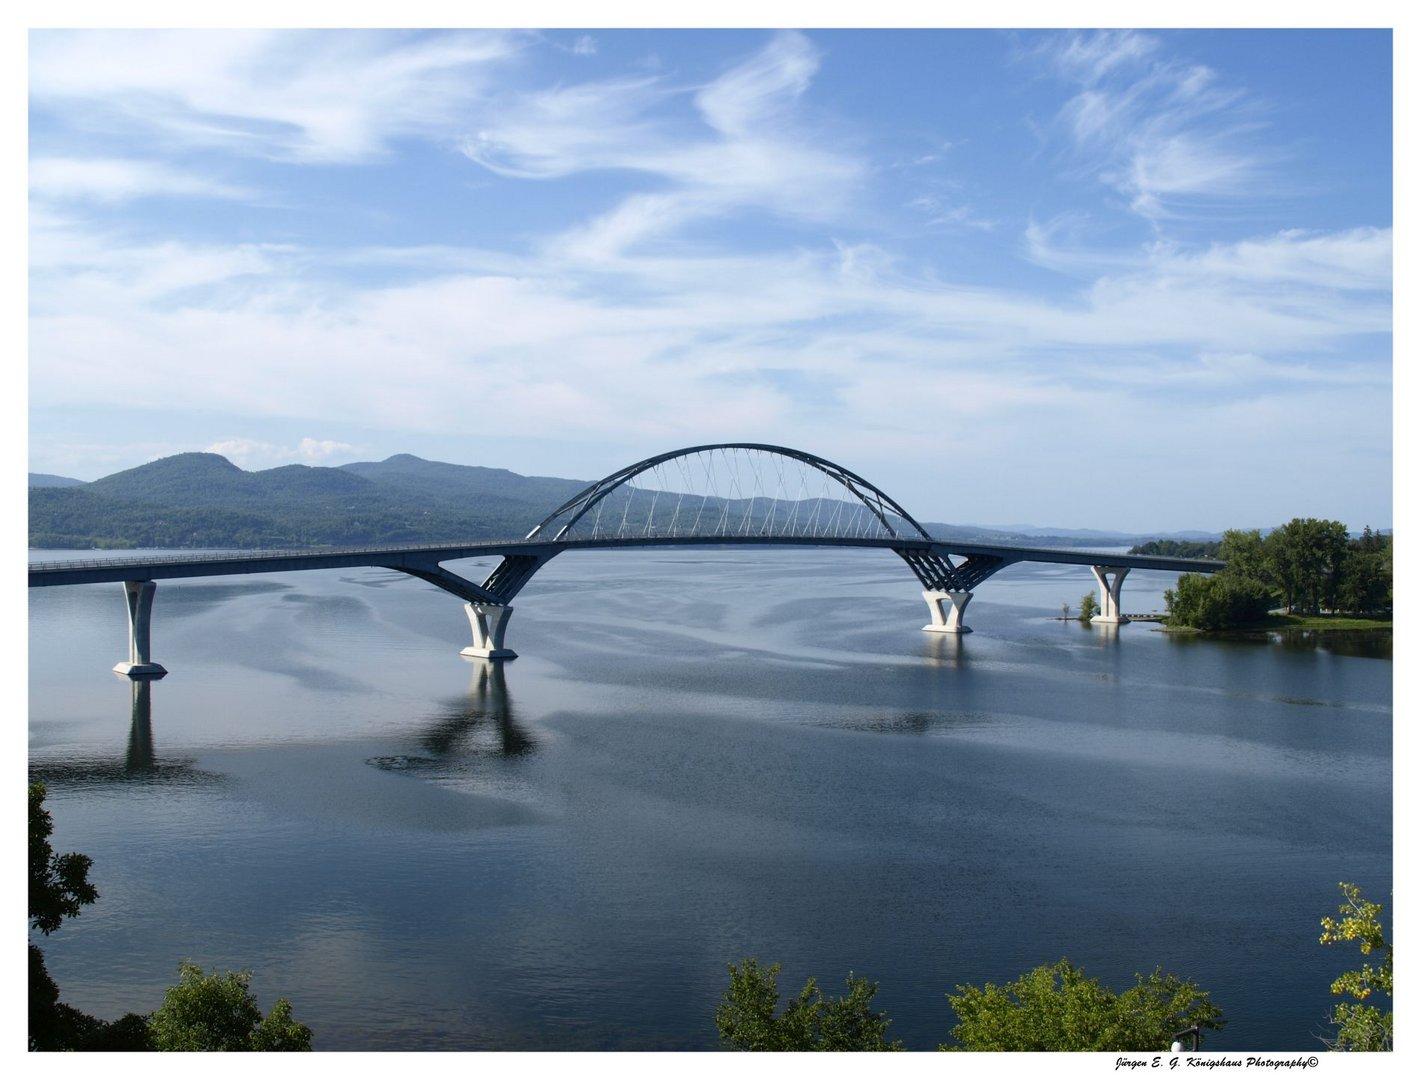 Lake Champlain Bridge - USA 2014